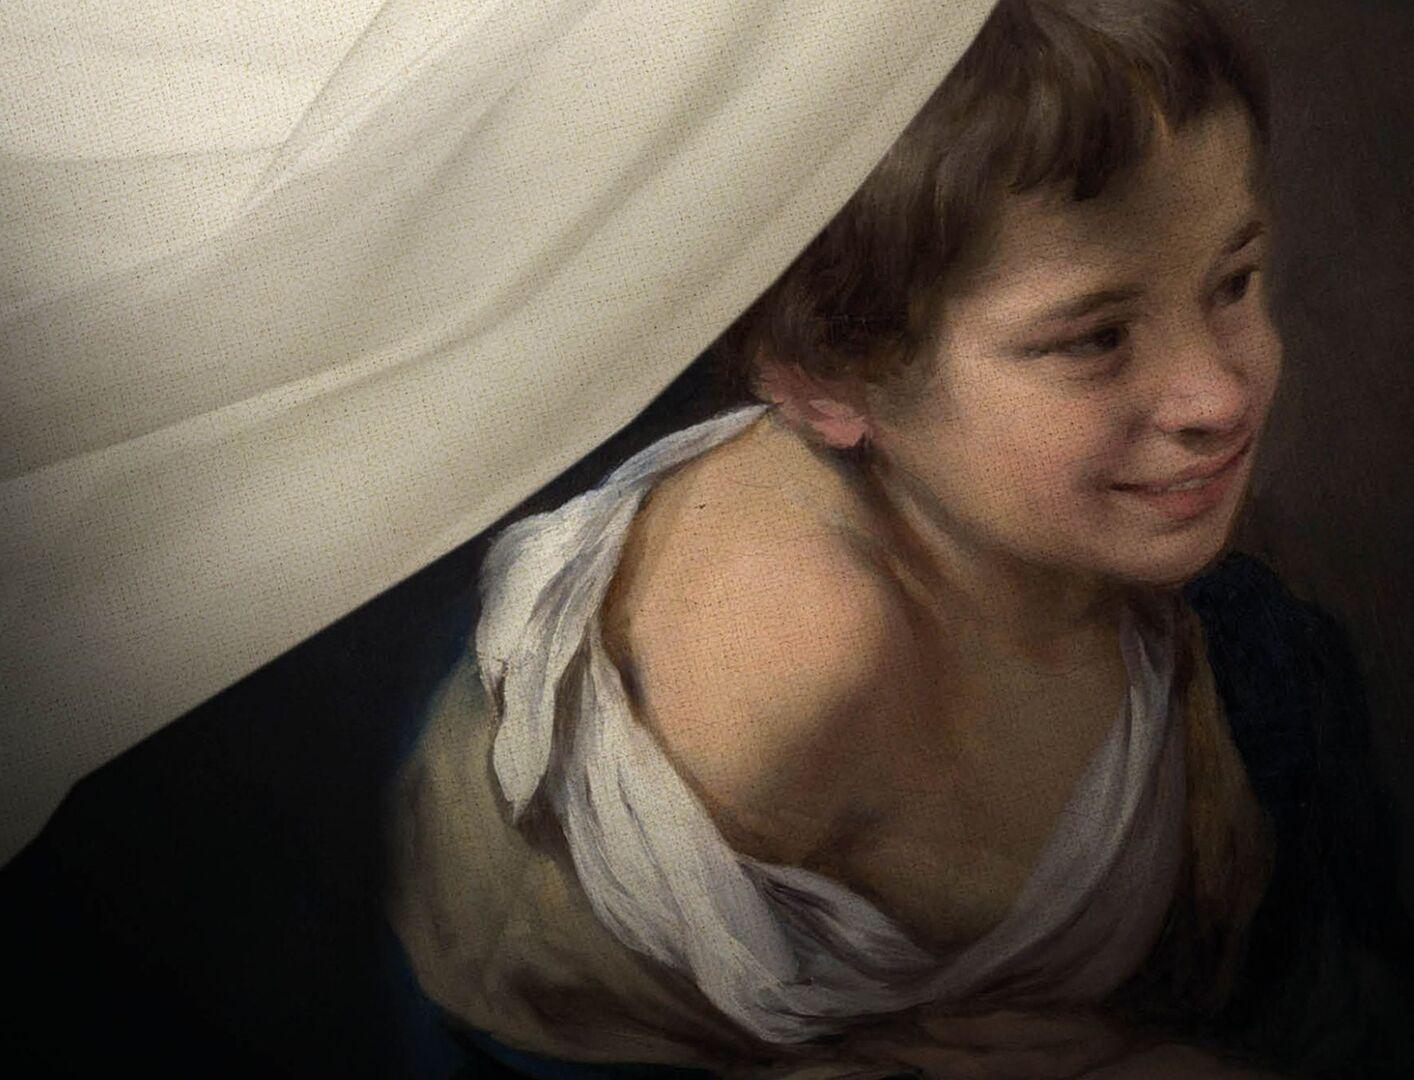 La tragedia que propició que Murillo fuese el mejor pintor de ...